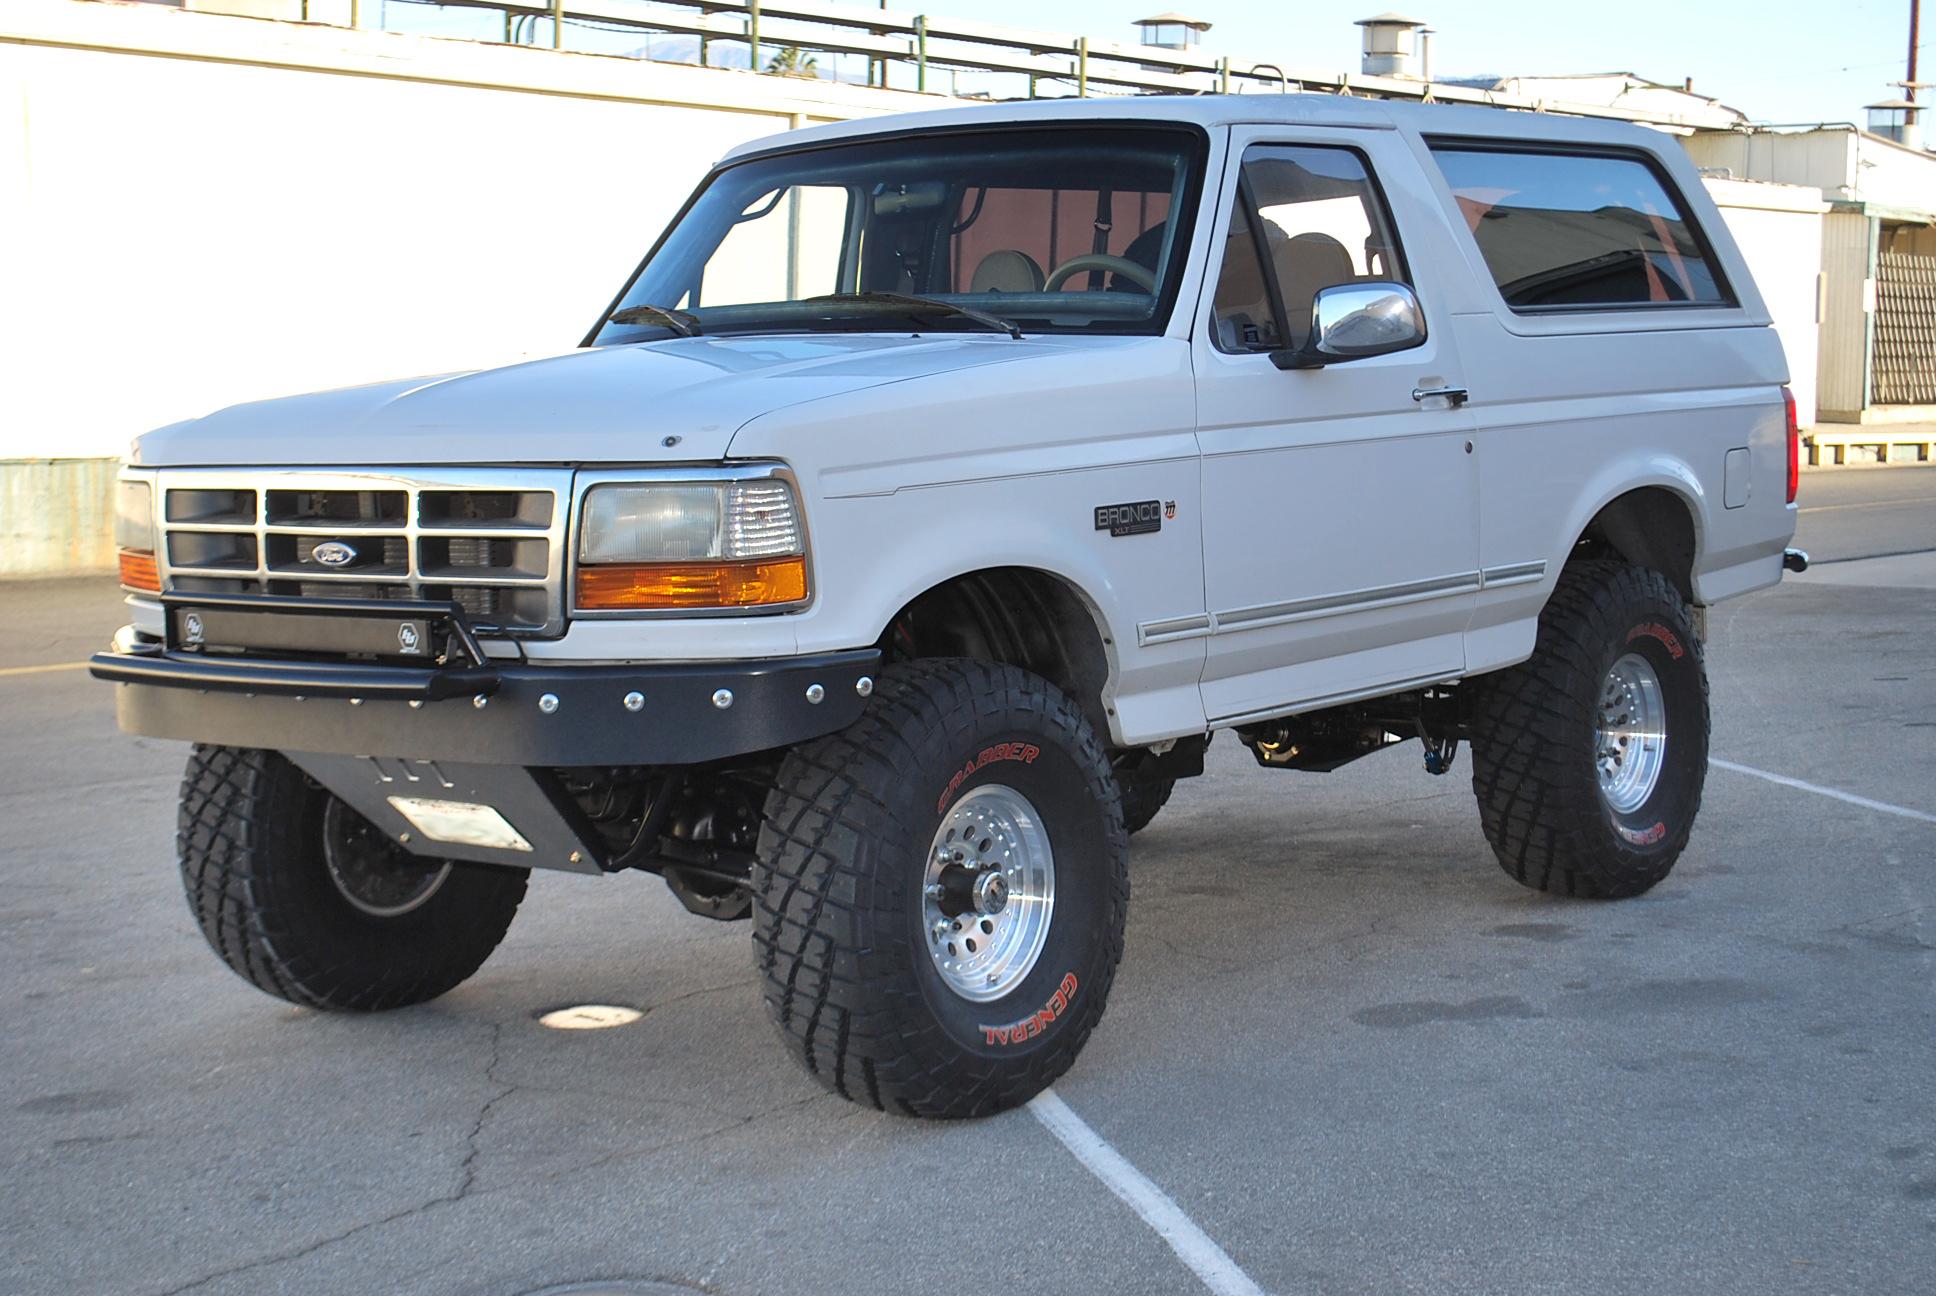 259590365997606125 furthermore Specs Chunk further 1985 Toyota Sr5 Wiring Diagram additionally Sidekick Tracker additionally 1996 Ford F150 Lift Kit. on geo tracker prerunner